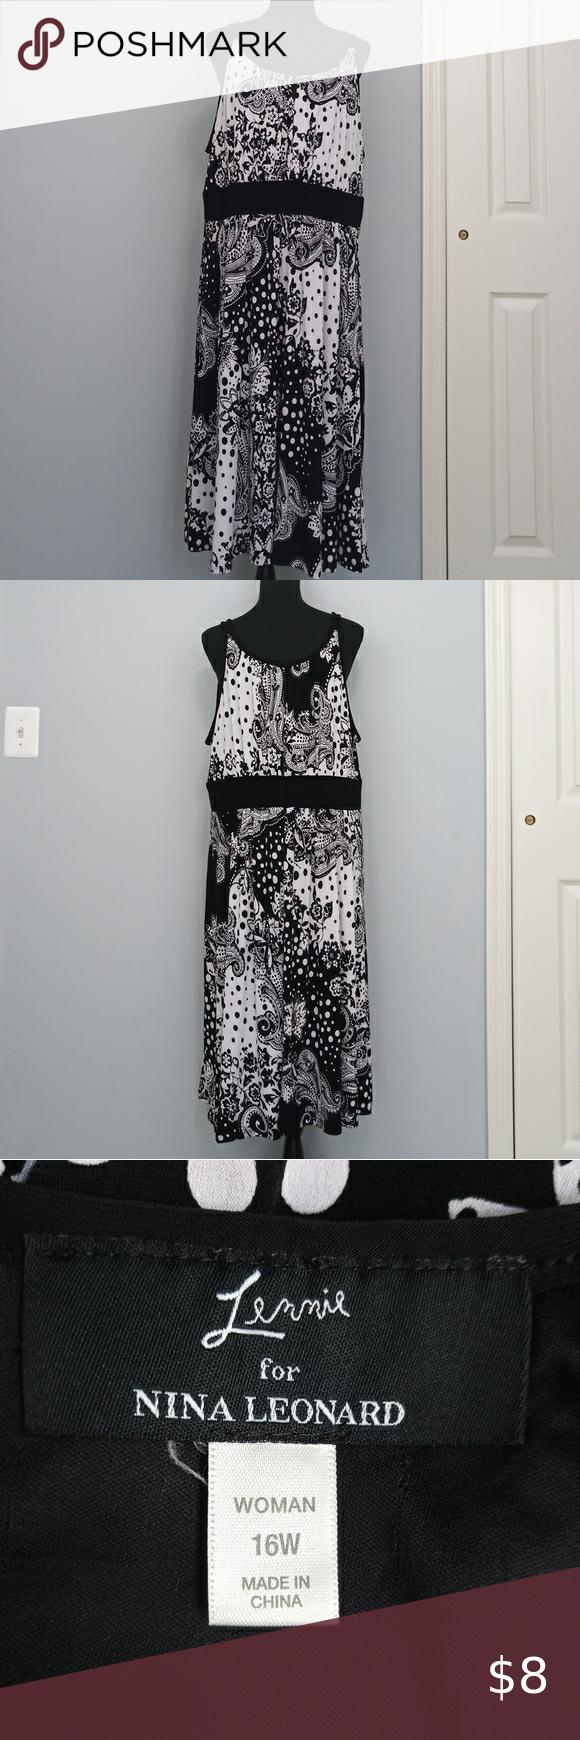 Stretchy Black And White Dress Black N White Dress White Dress Dresses [ 1740 x 580 Pixel ]